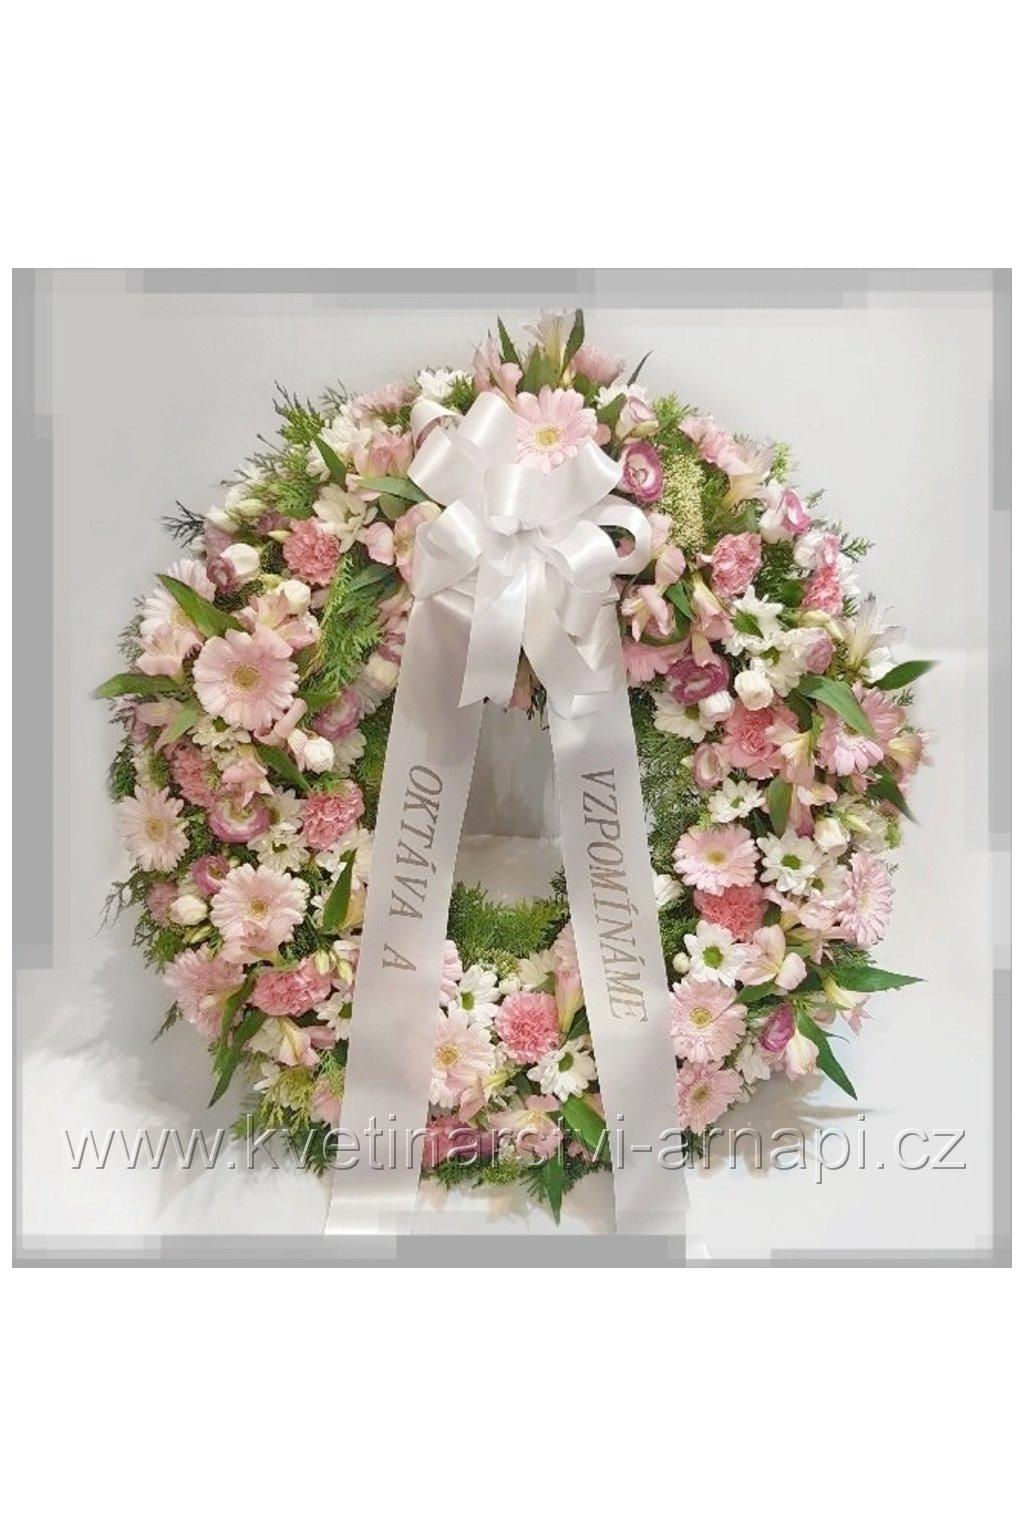 smutecni venec smutecni stuha rozvoz eshop kvetinarstvi arnapi